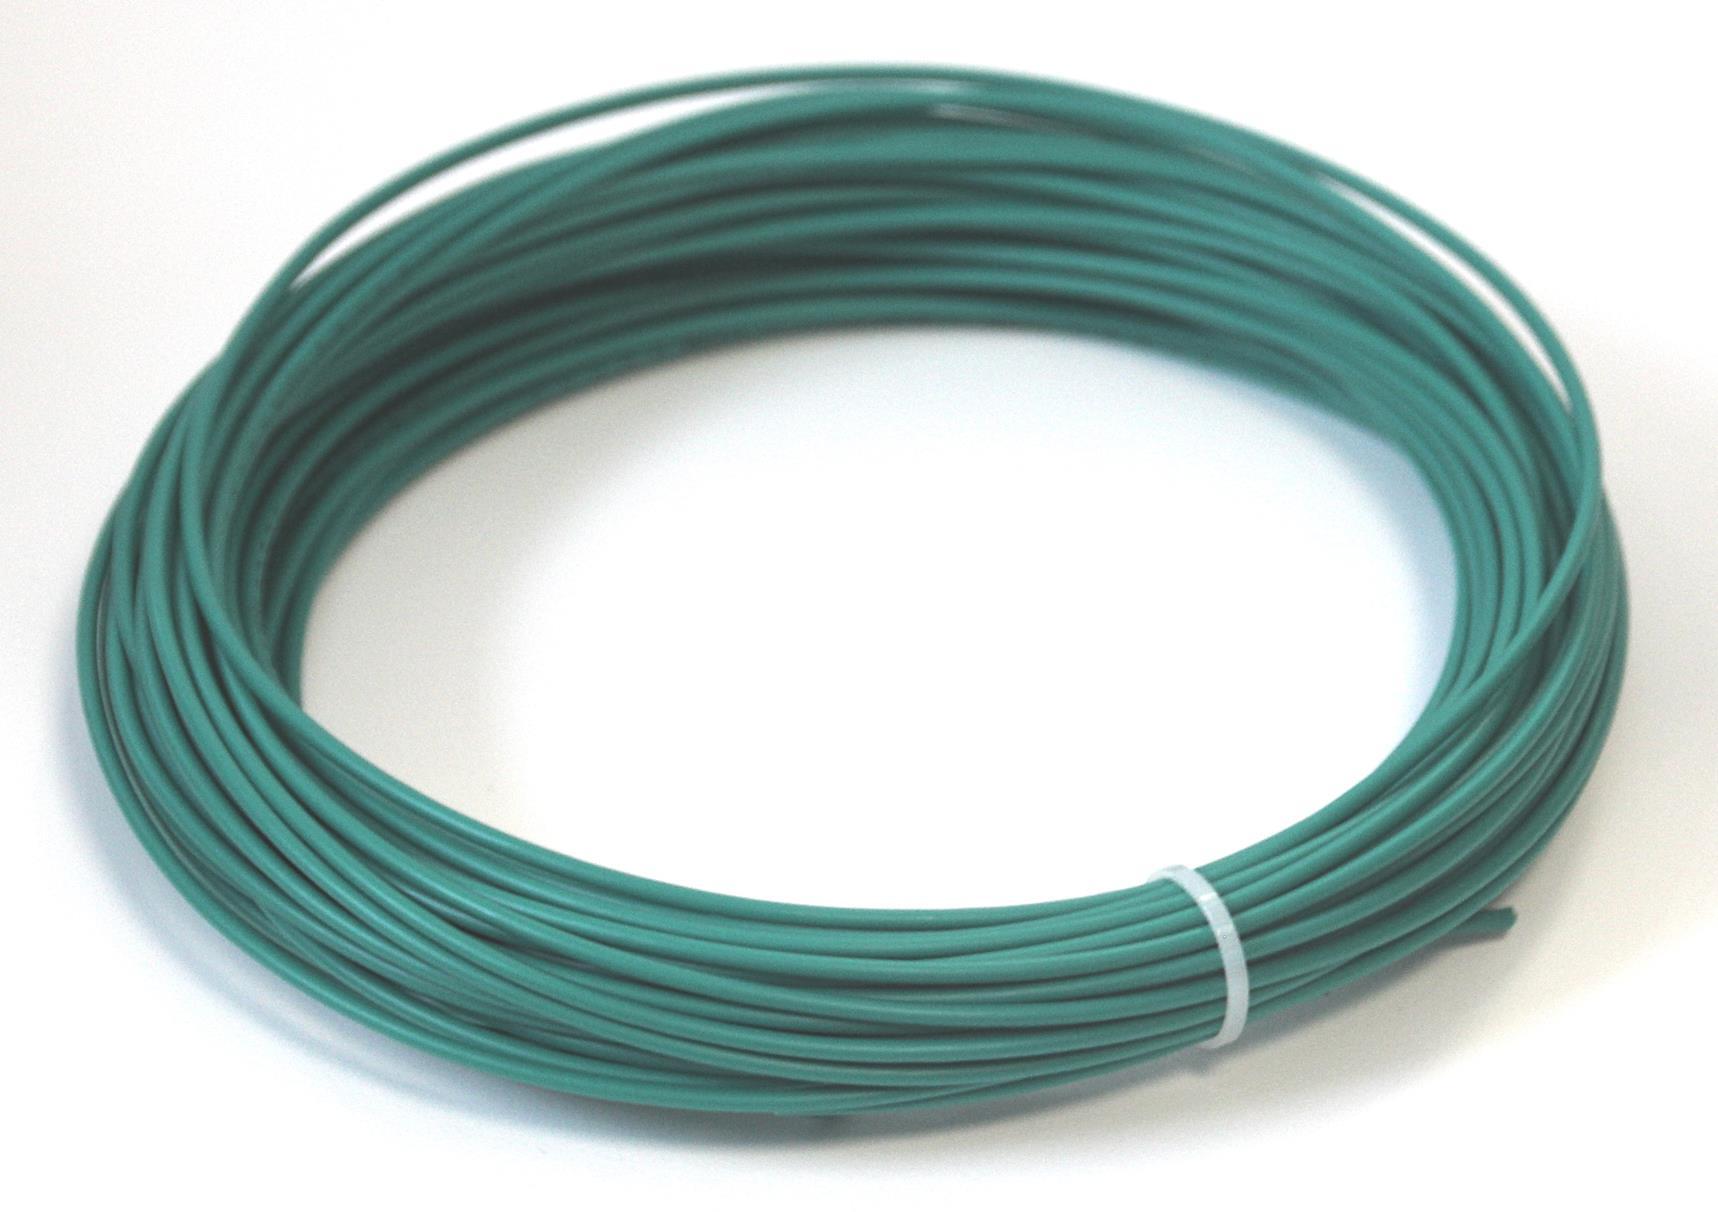 Begrenzungskabel Kabel 100m Worx Landroid WG754 WG799 Begrenzungsdraht Ø2,7mm